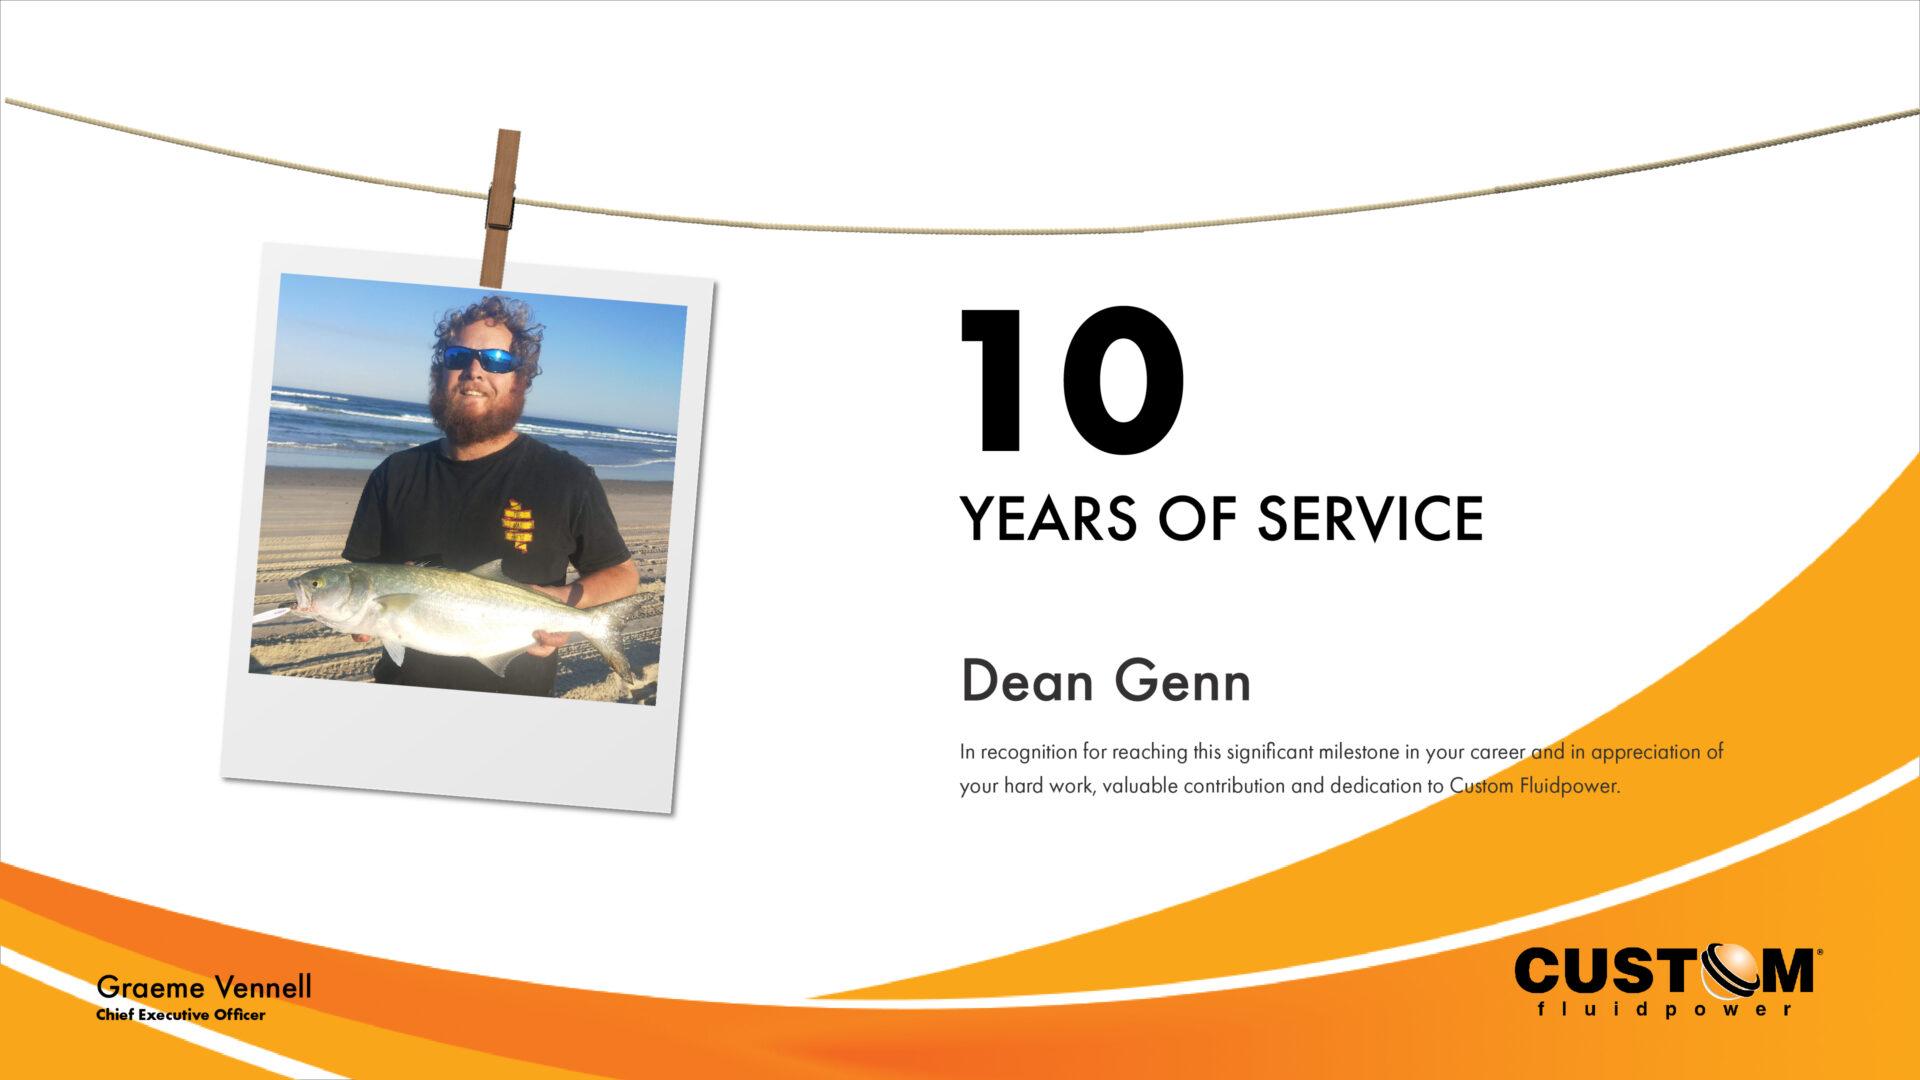 Custom Fliudpower Dean Genn